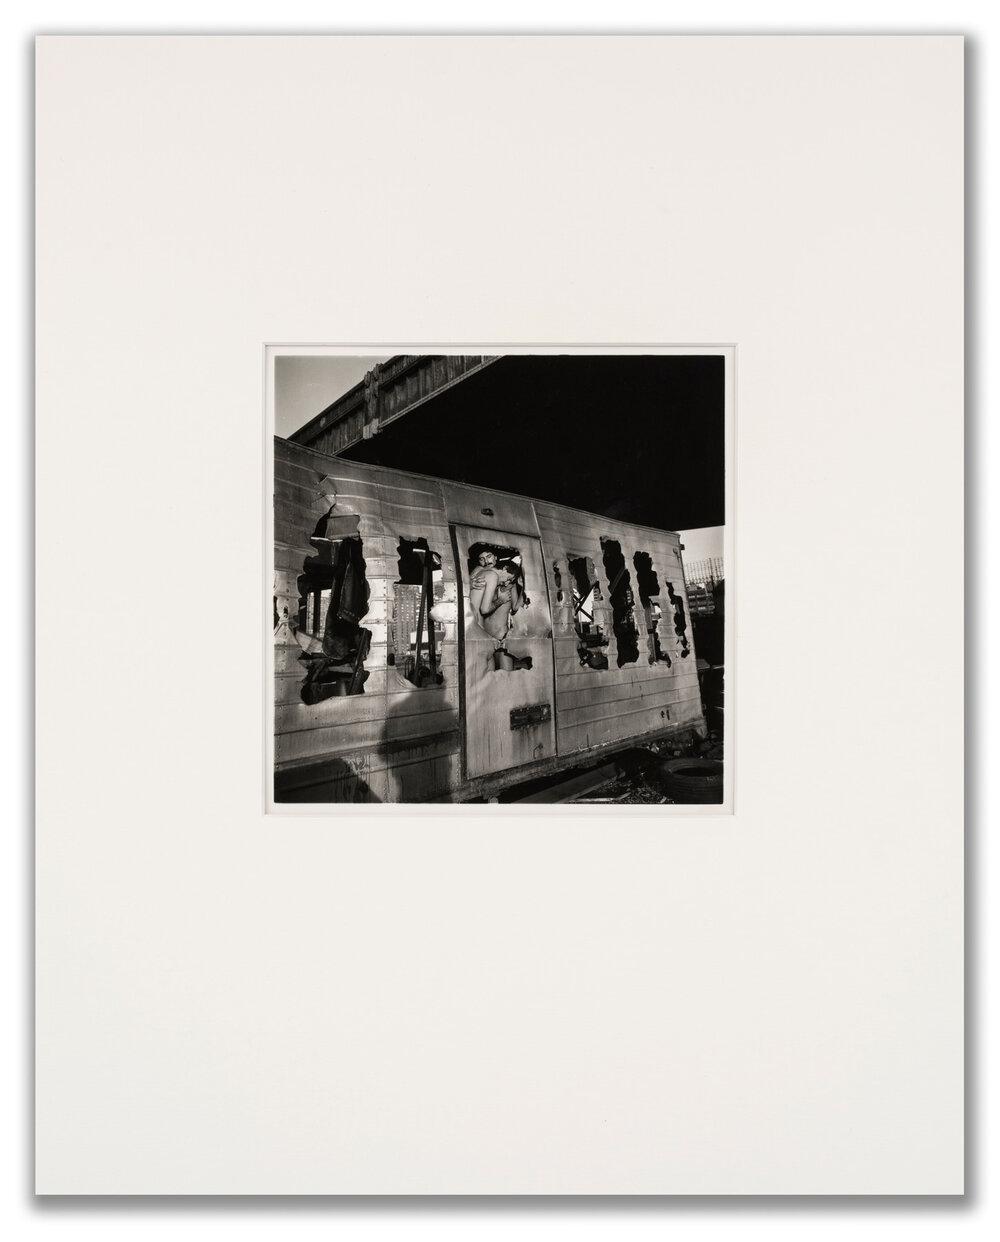 Arthur Tress, (American b.1940), Untitled, c.1980.